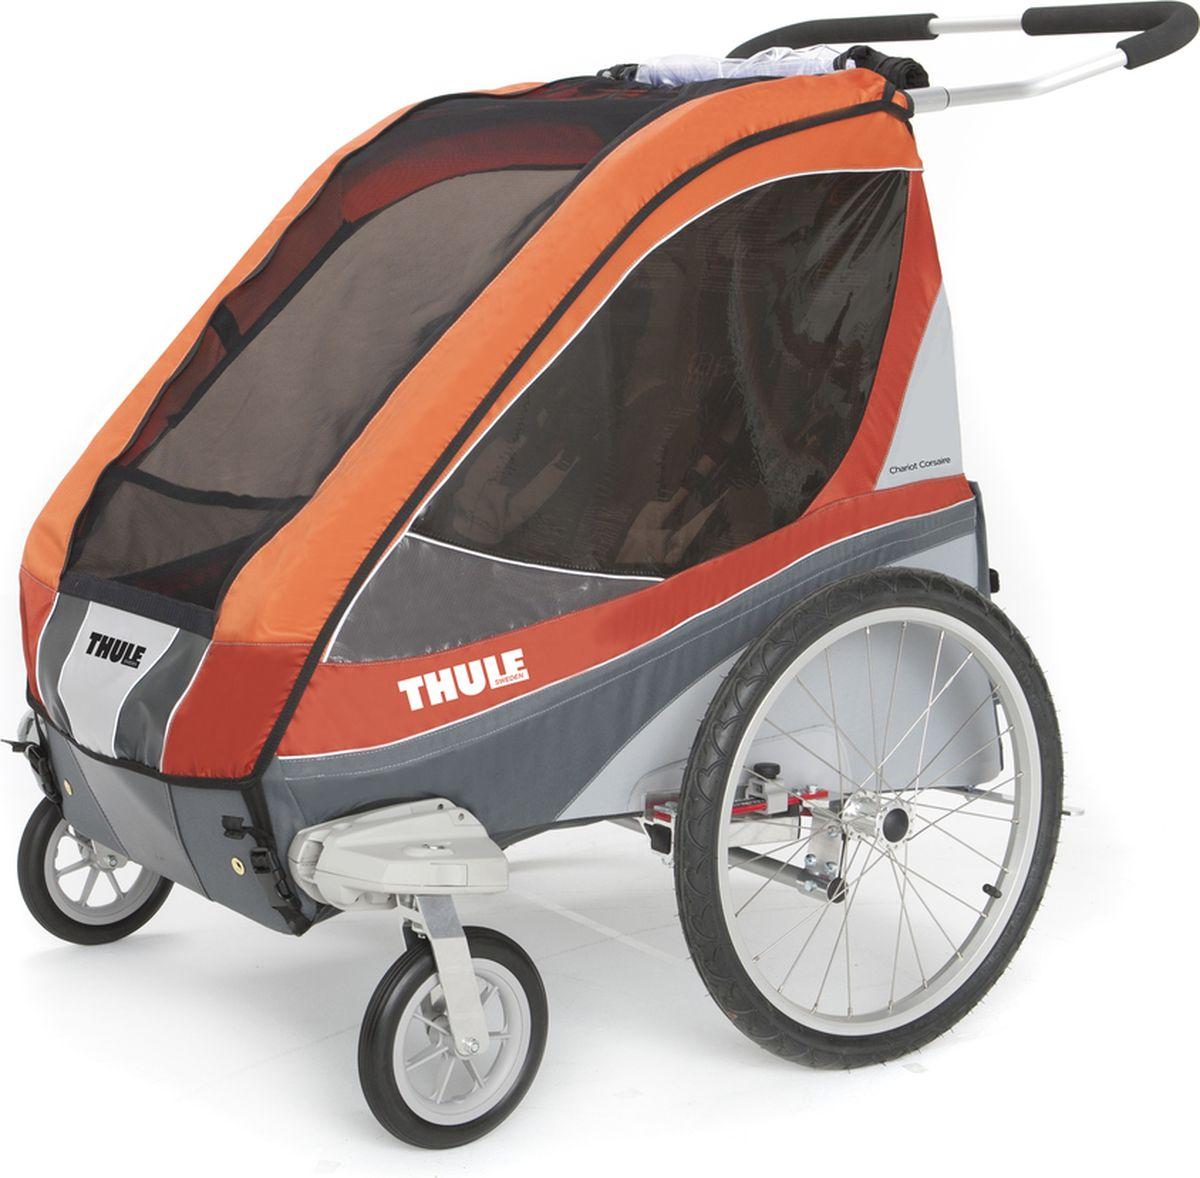 Thule Коляска-трансформер Chariot Corsaire 2 цвет абрикосовый thule набор спортивной коляски chariot 1 для серии cx